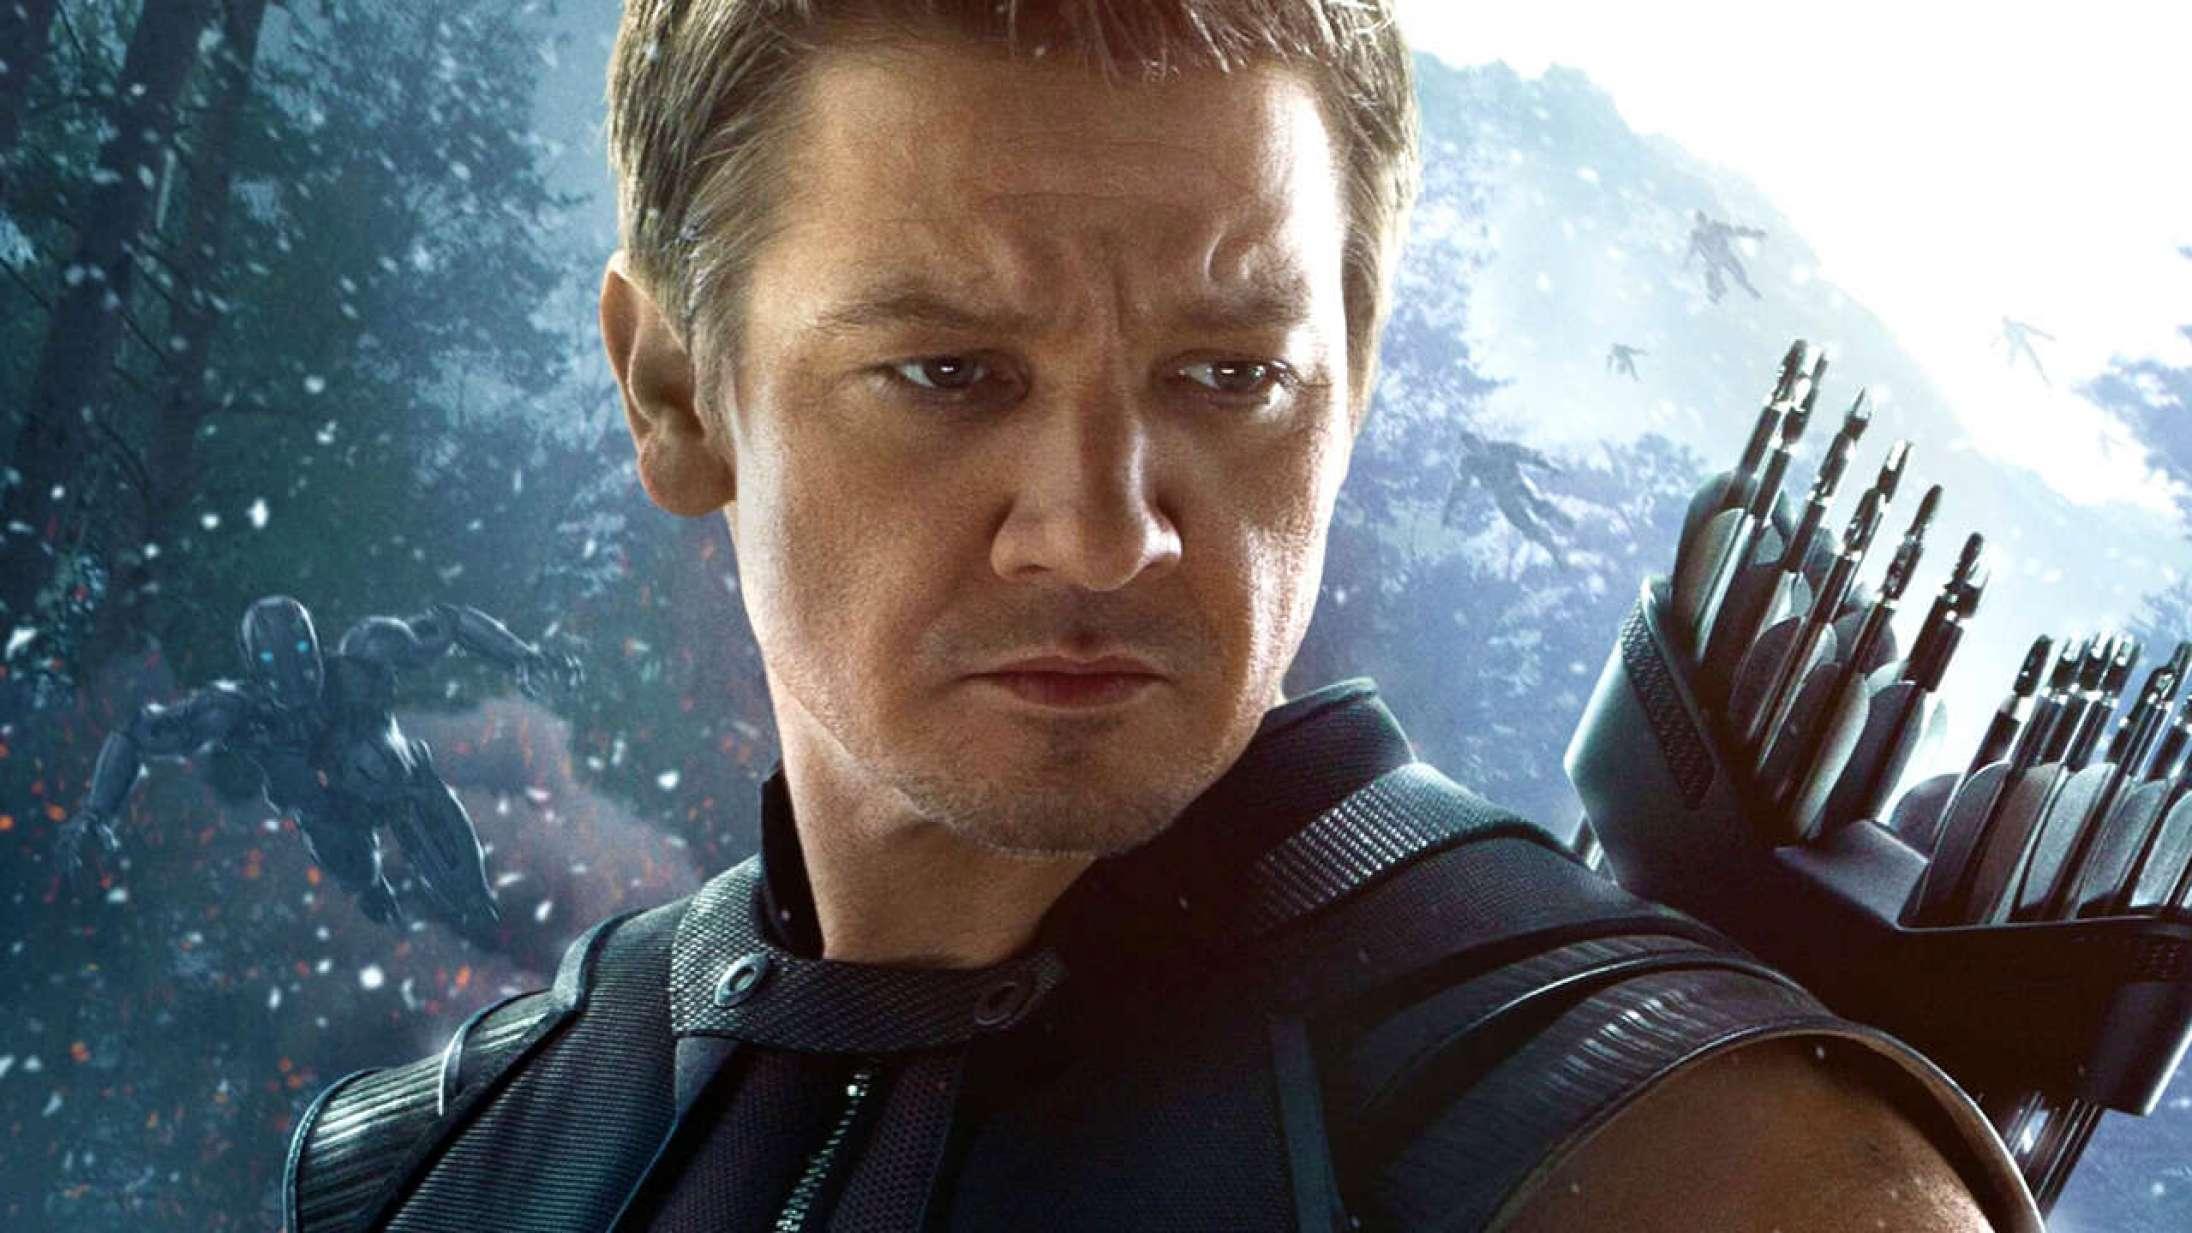 Marvel-serien 'Hawkeye' får premieredato på Disney+